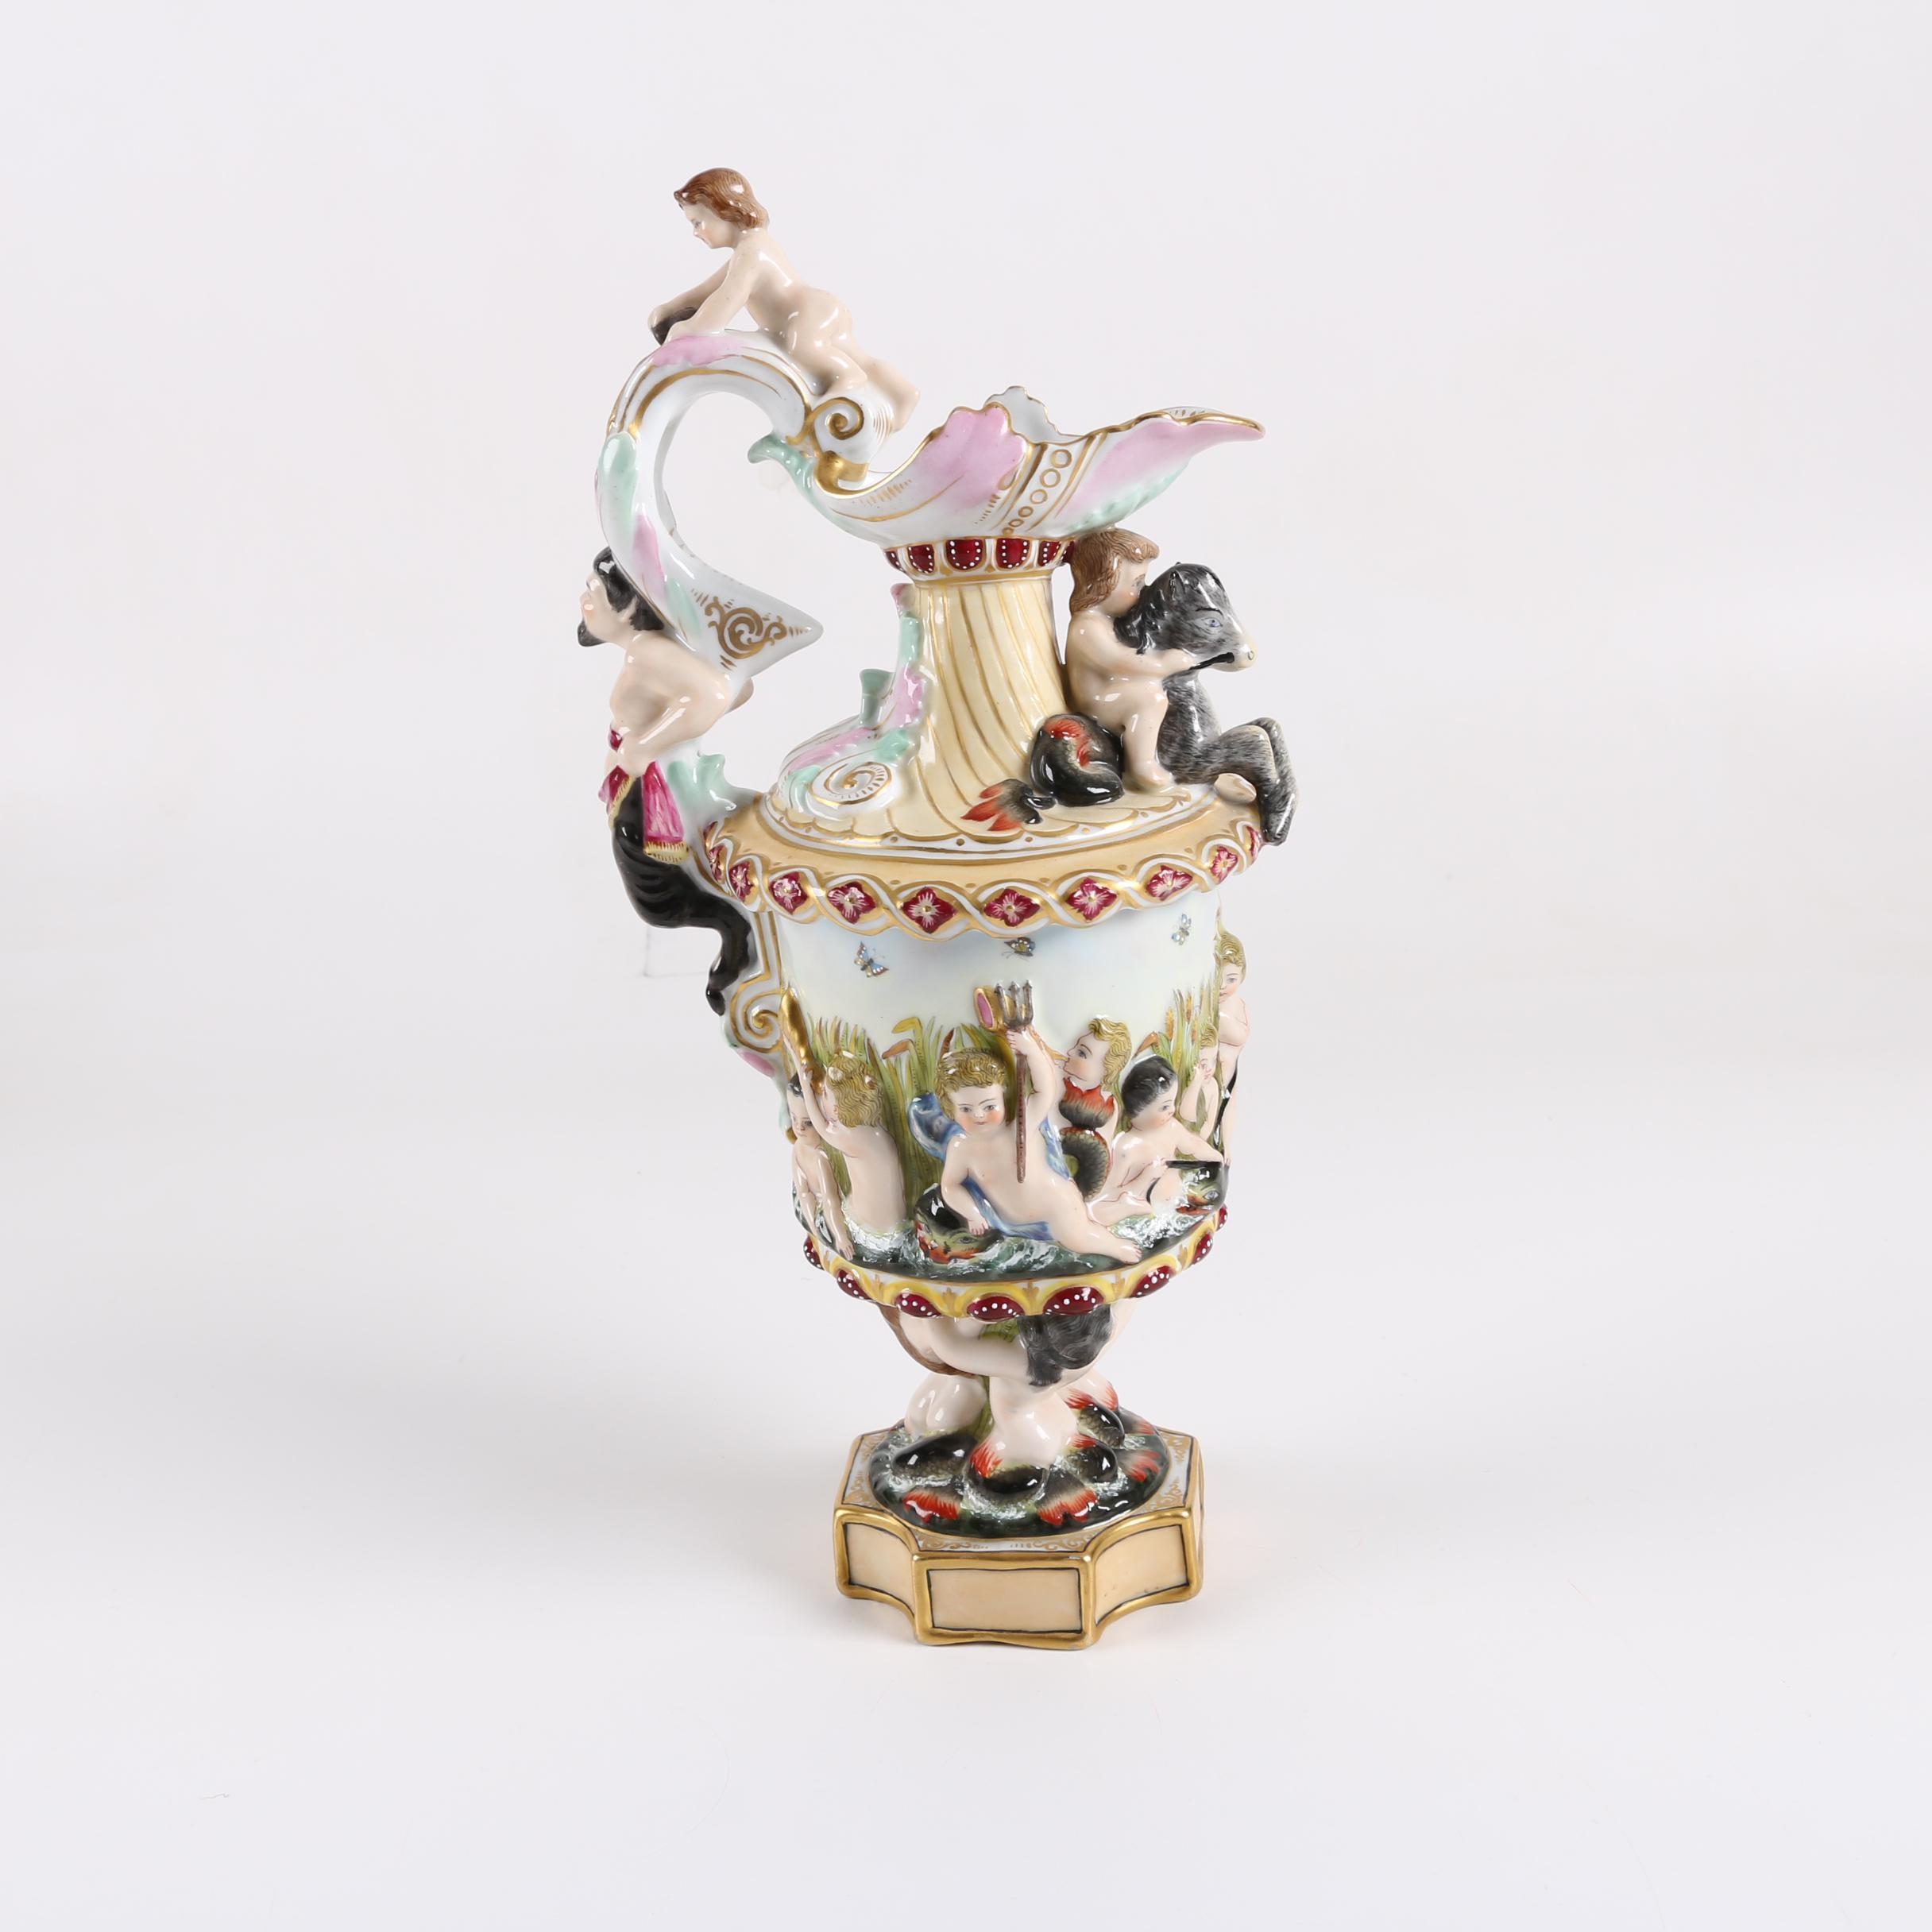 Capodimonte Style Porcelain Ewer with Figural Cherub Motif